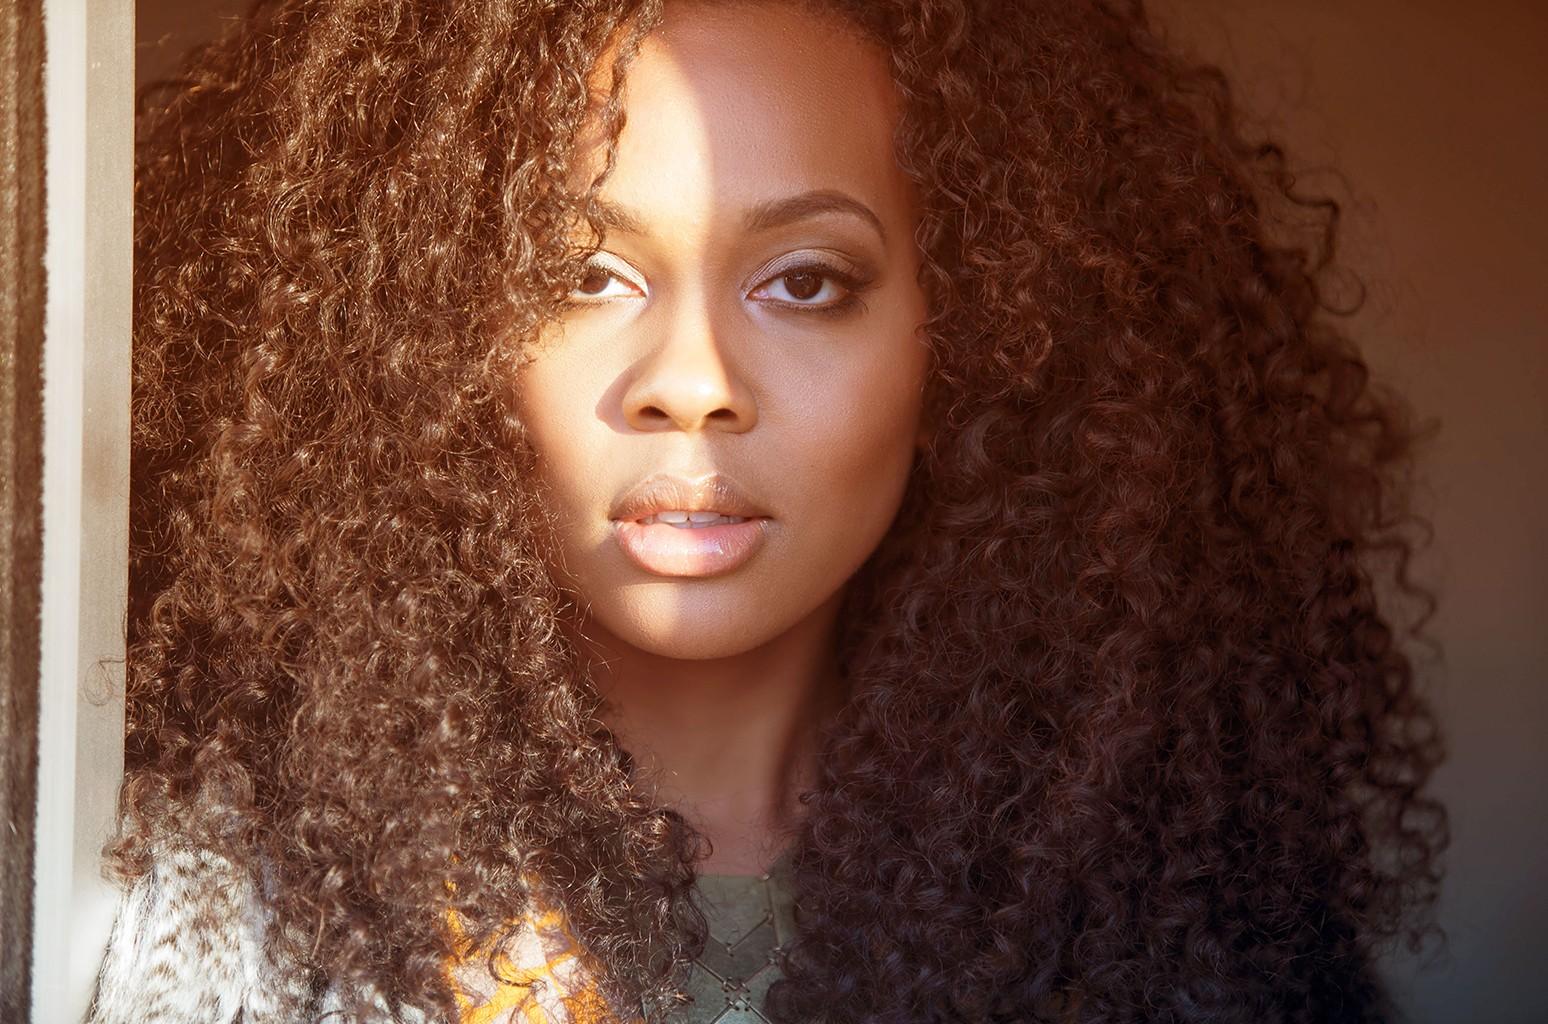 Ashleigh Smith Extols the 'Sunkissed' Beauty of Jazz